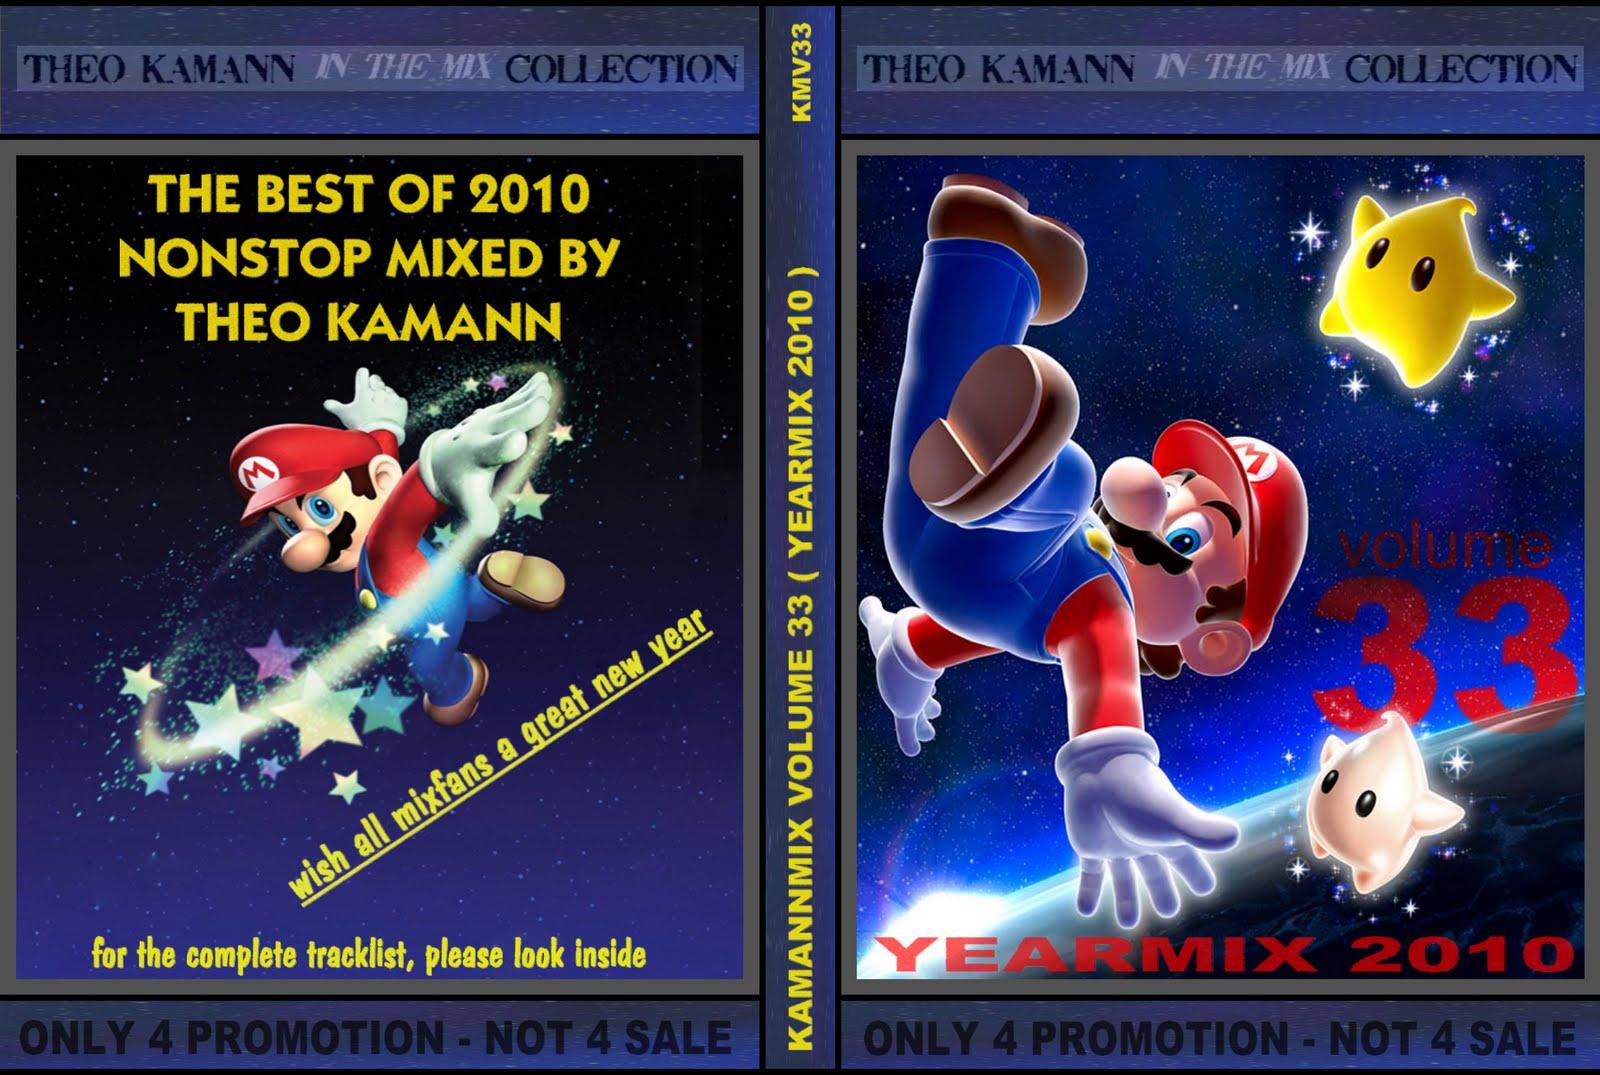 http://4.bp.blogspot.com/_-wvCpXz4oAs/TR_fGsiQ51I/AAAAAAAAB2g/7E0r7EtyQ_I/s1600/Theo_Kamann_Presents_Kamannmix_Volume_33_%2528The_Yearmix_2010%2529-complete_1.jpg